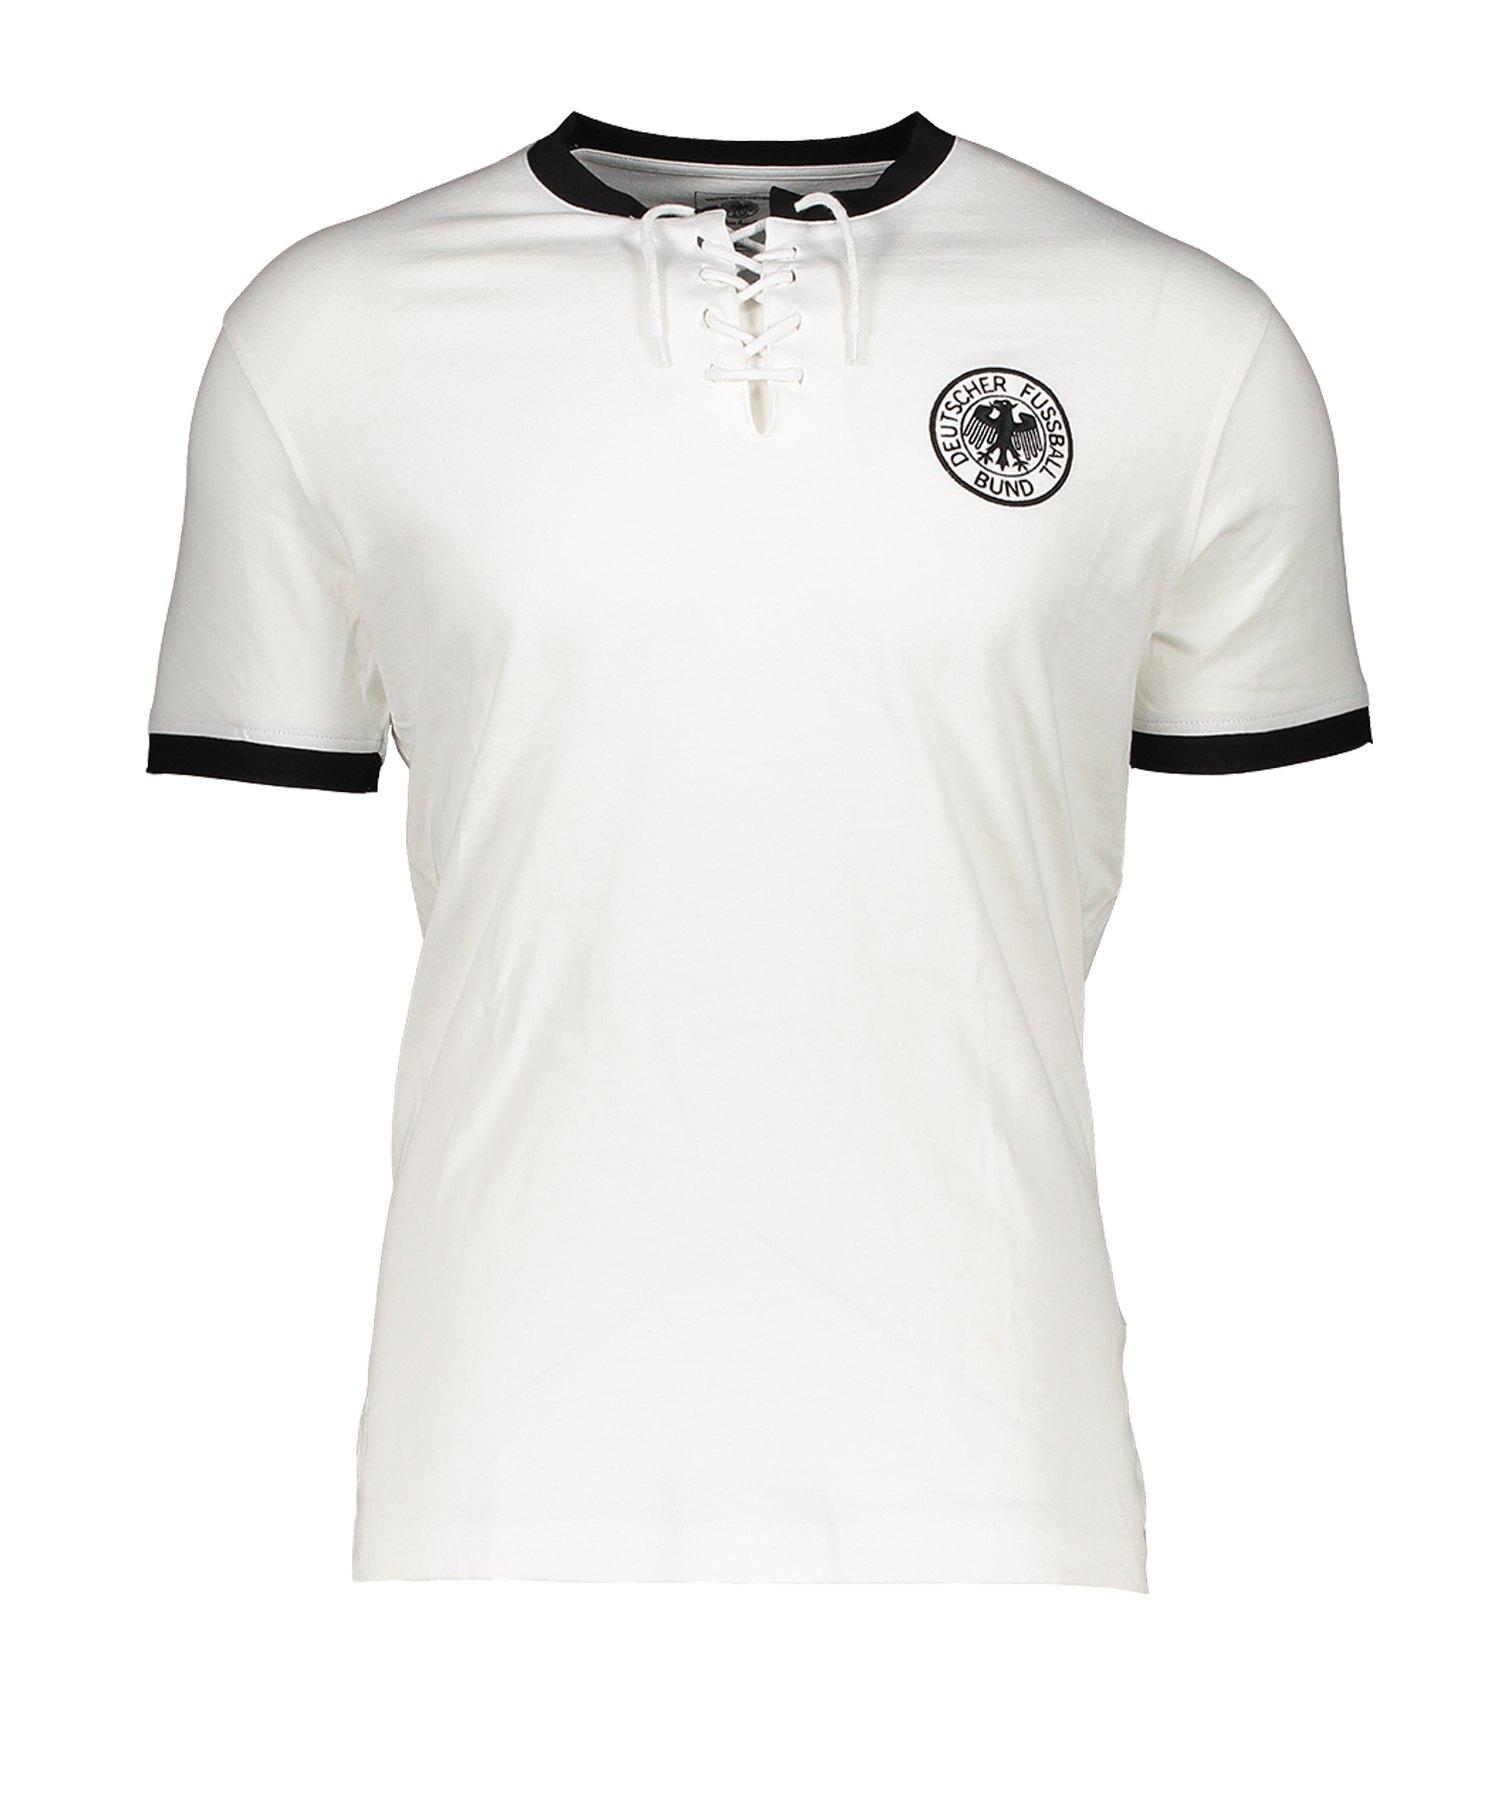 DFB Deutschland Retro 1954 T-Shirt Home Weiss - Weiss